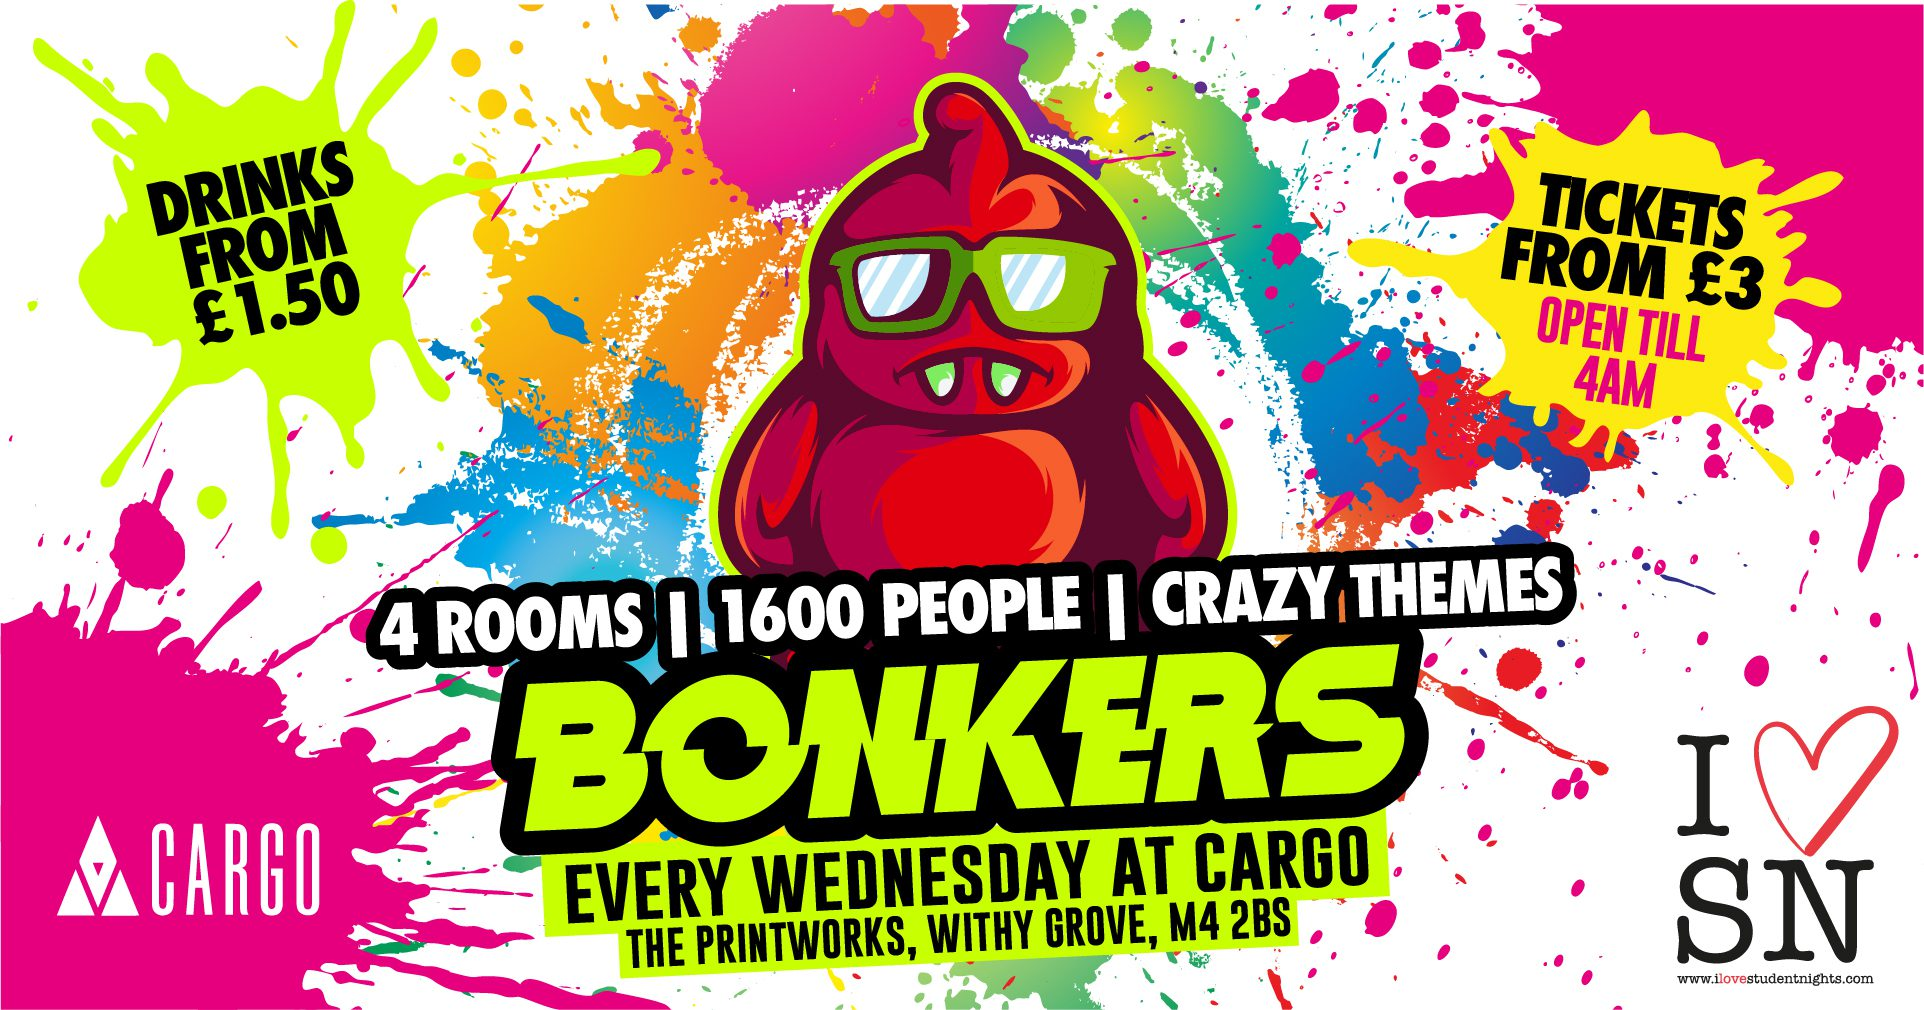 Bonkers Manchester